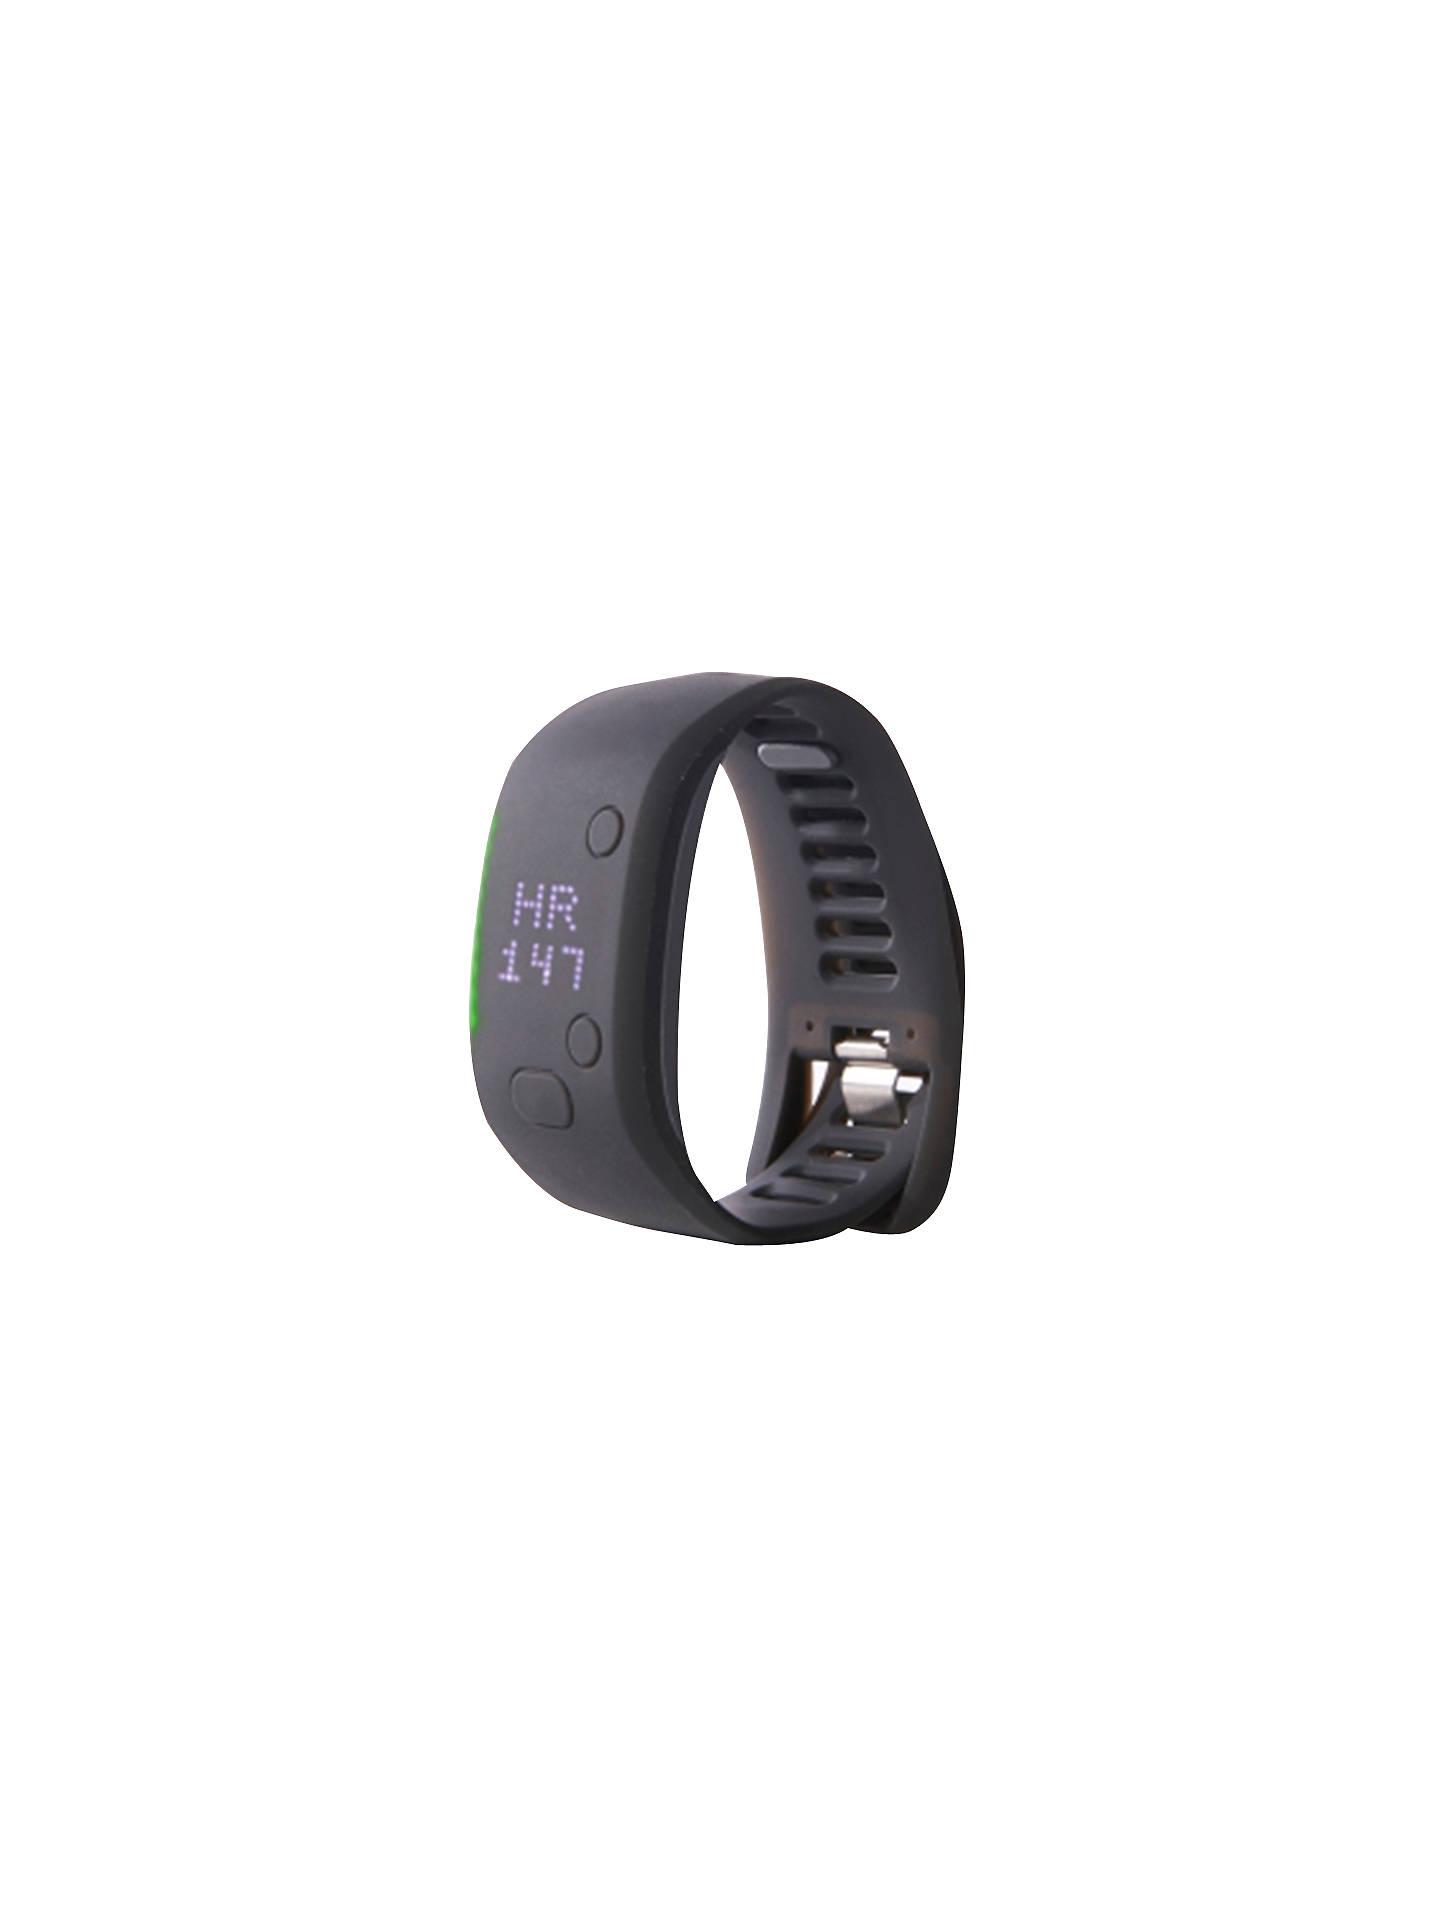 sale retailer 02649 23df7 Buy Adidas miCoach FIT SMART Running Watch, Black, S Online at  johnlewis.com ...